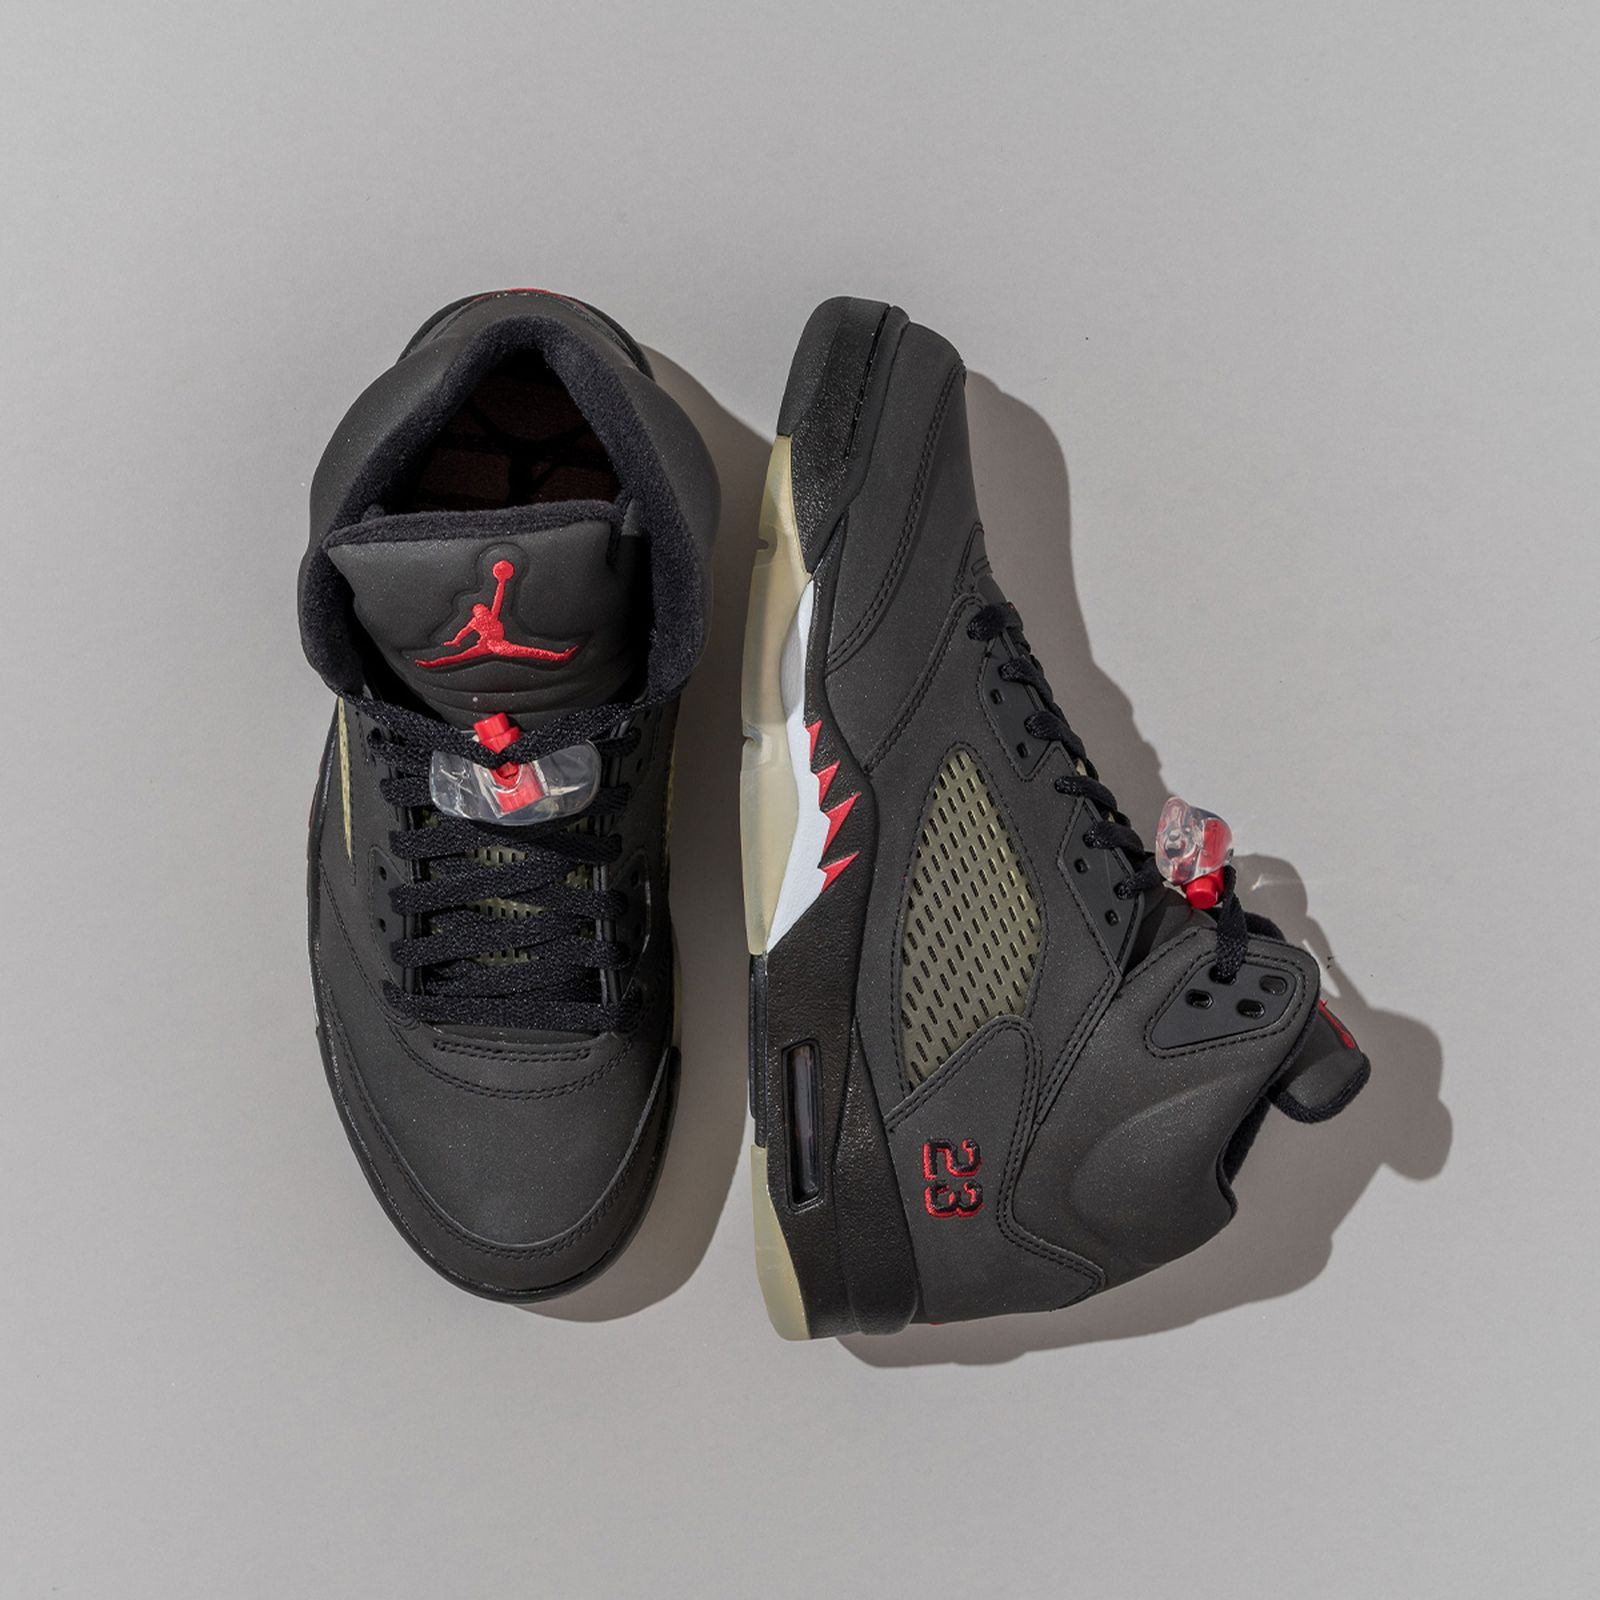 brad-hogan-jordan-sneaker-collection-01 2